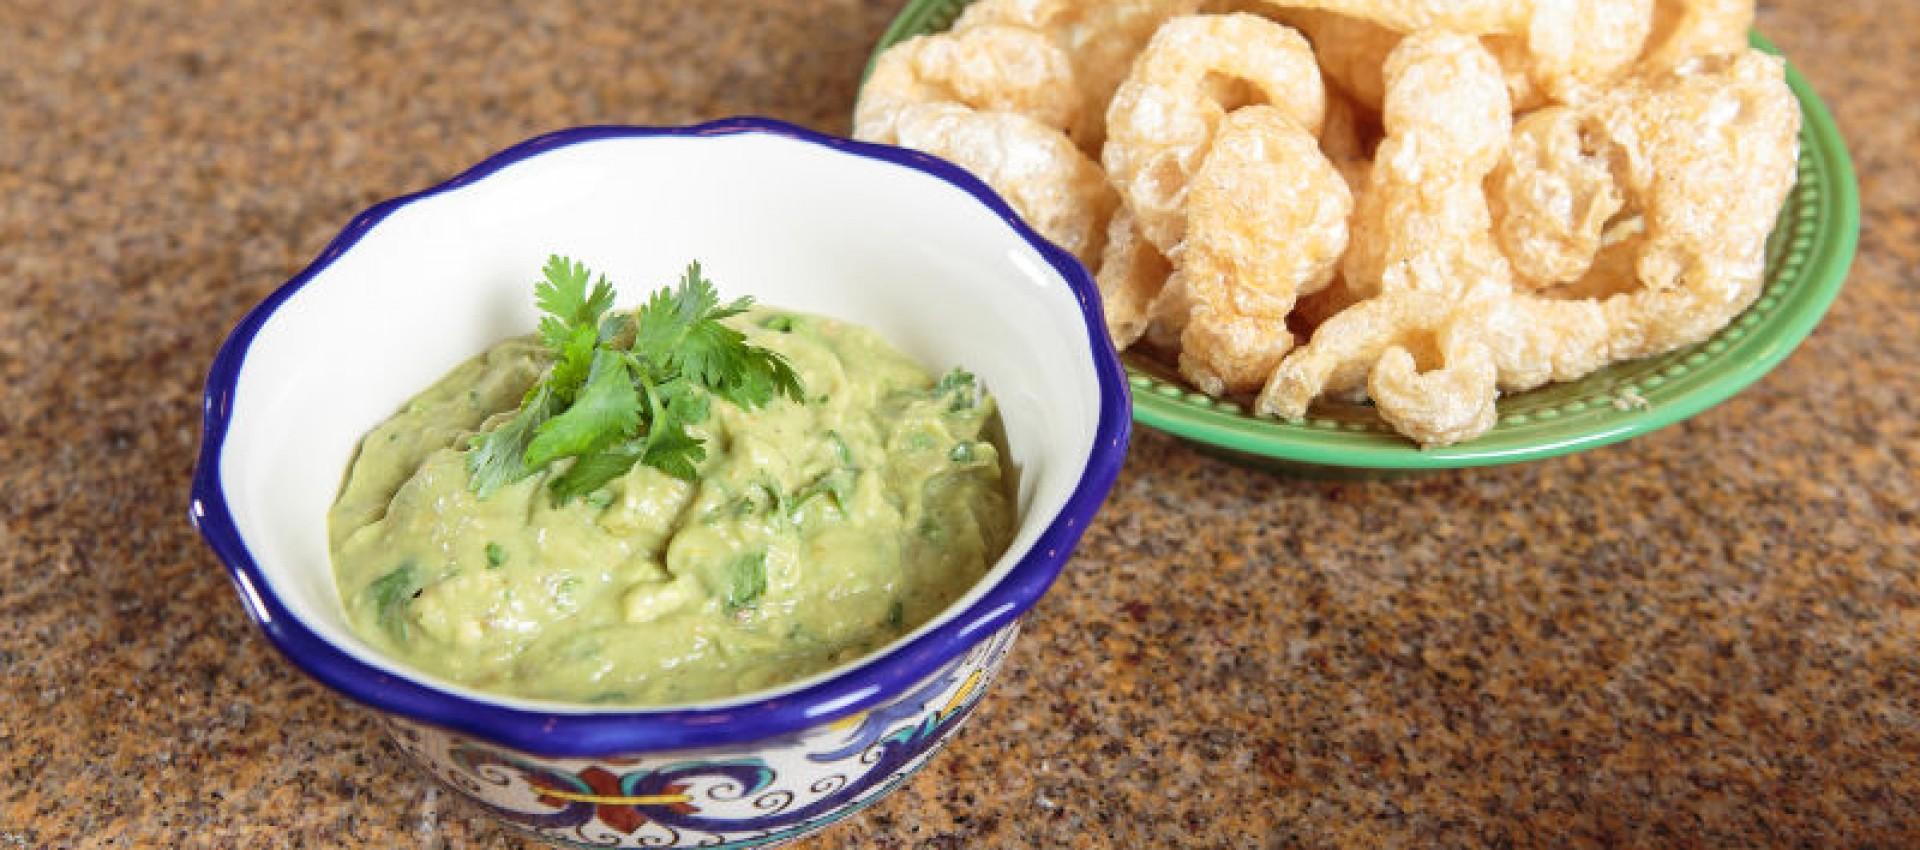 Best Guacamole Dip Recipe Image